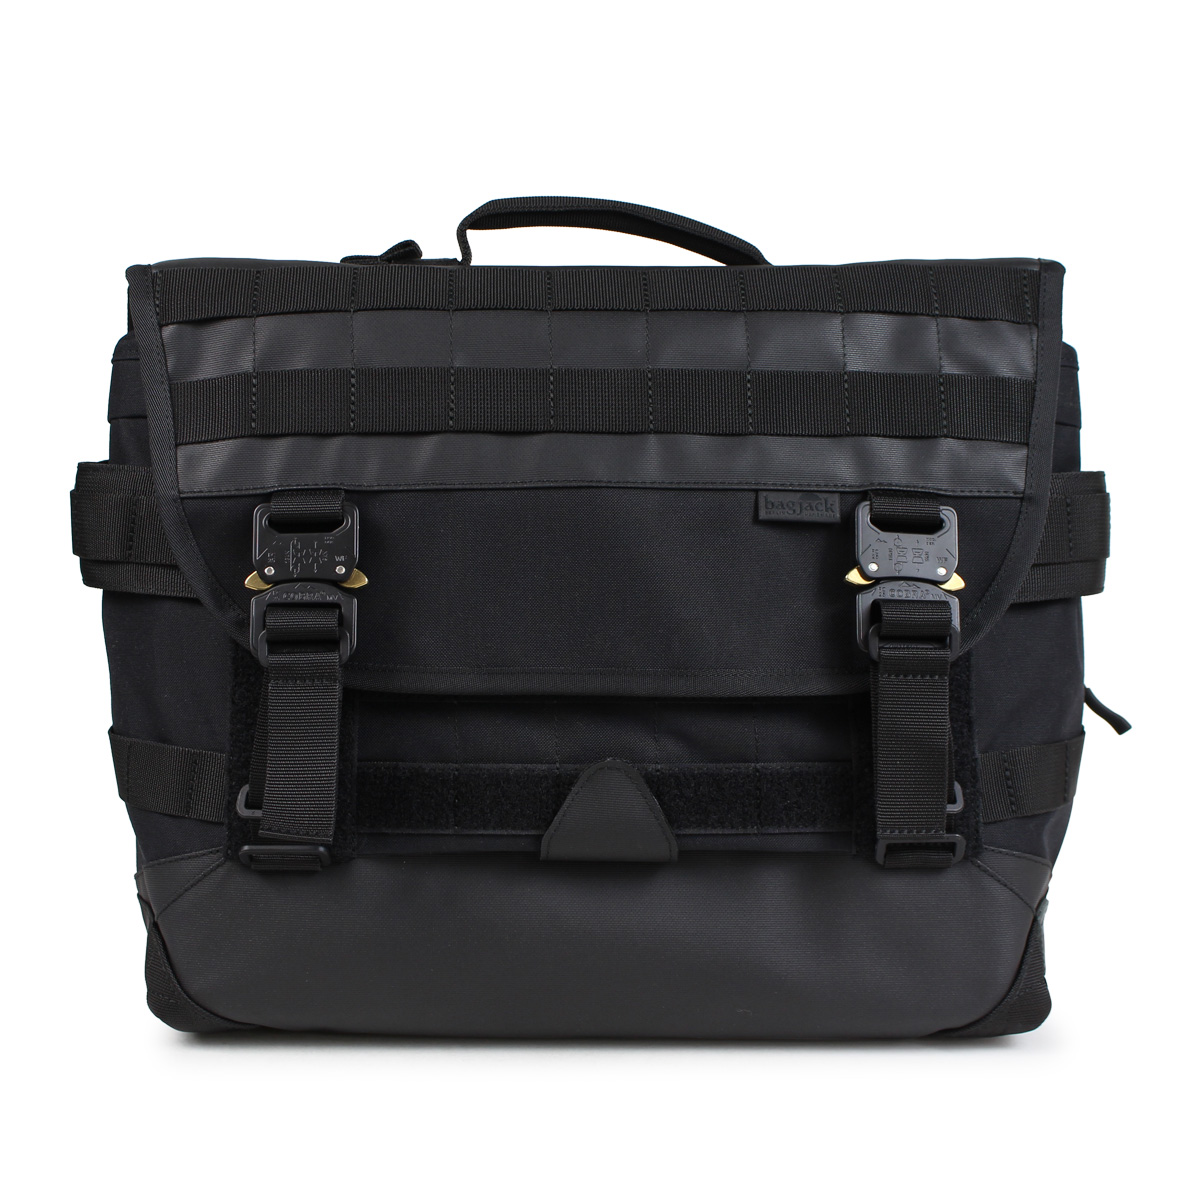 bagjack NEXT LEVEL MESSENGER S TECH LINE バッグジャック メッセンジャーバッグ ショルダーバッグ メンズ レディース ブラック [191]